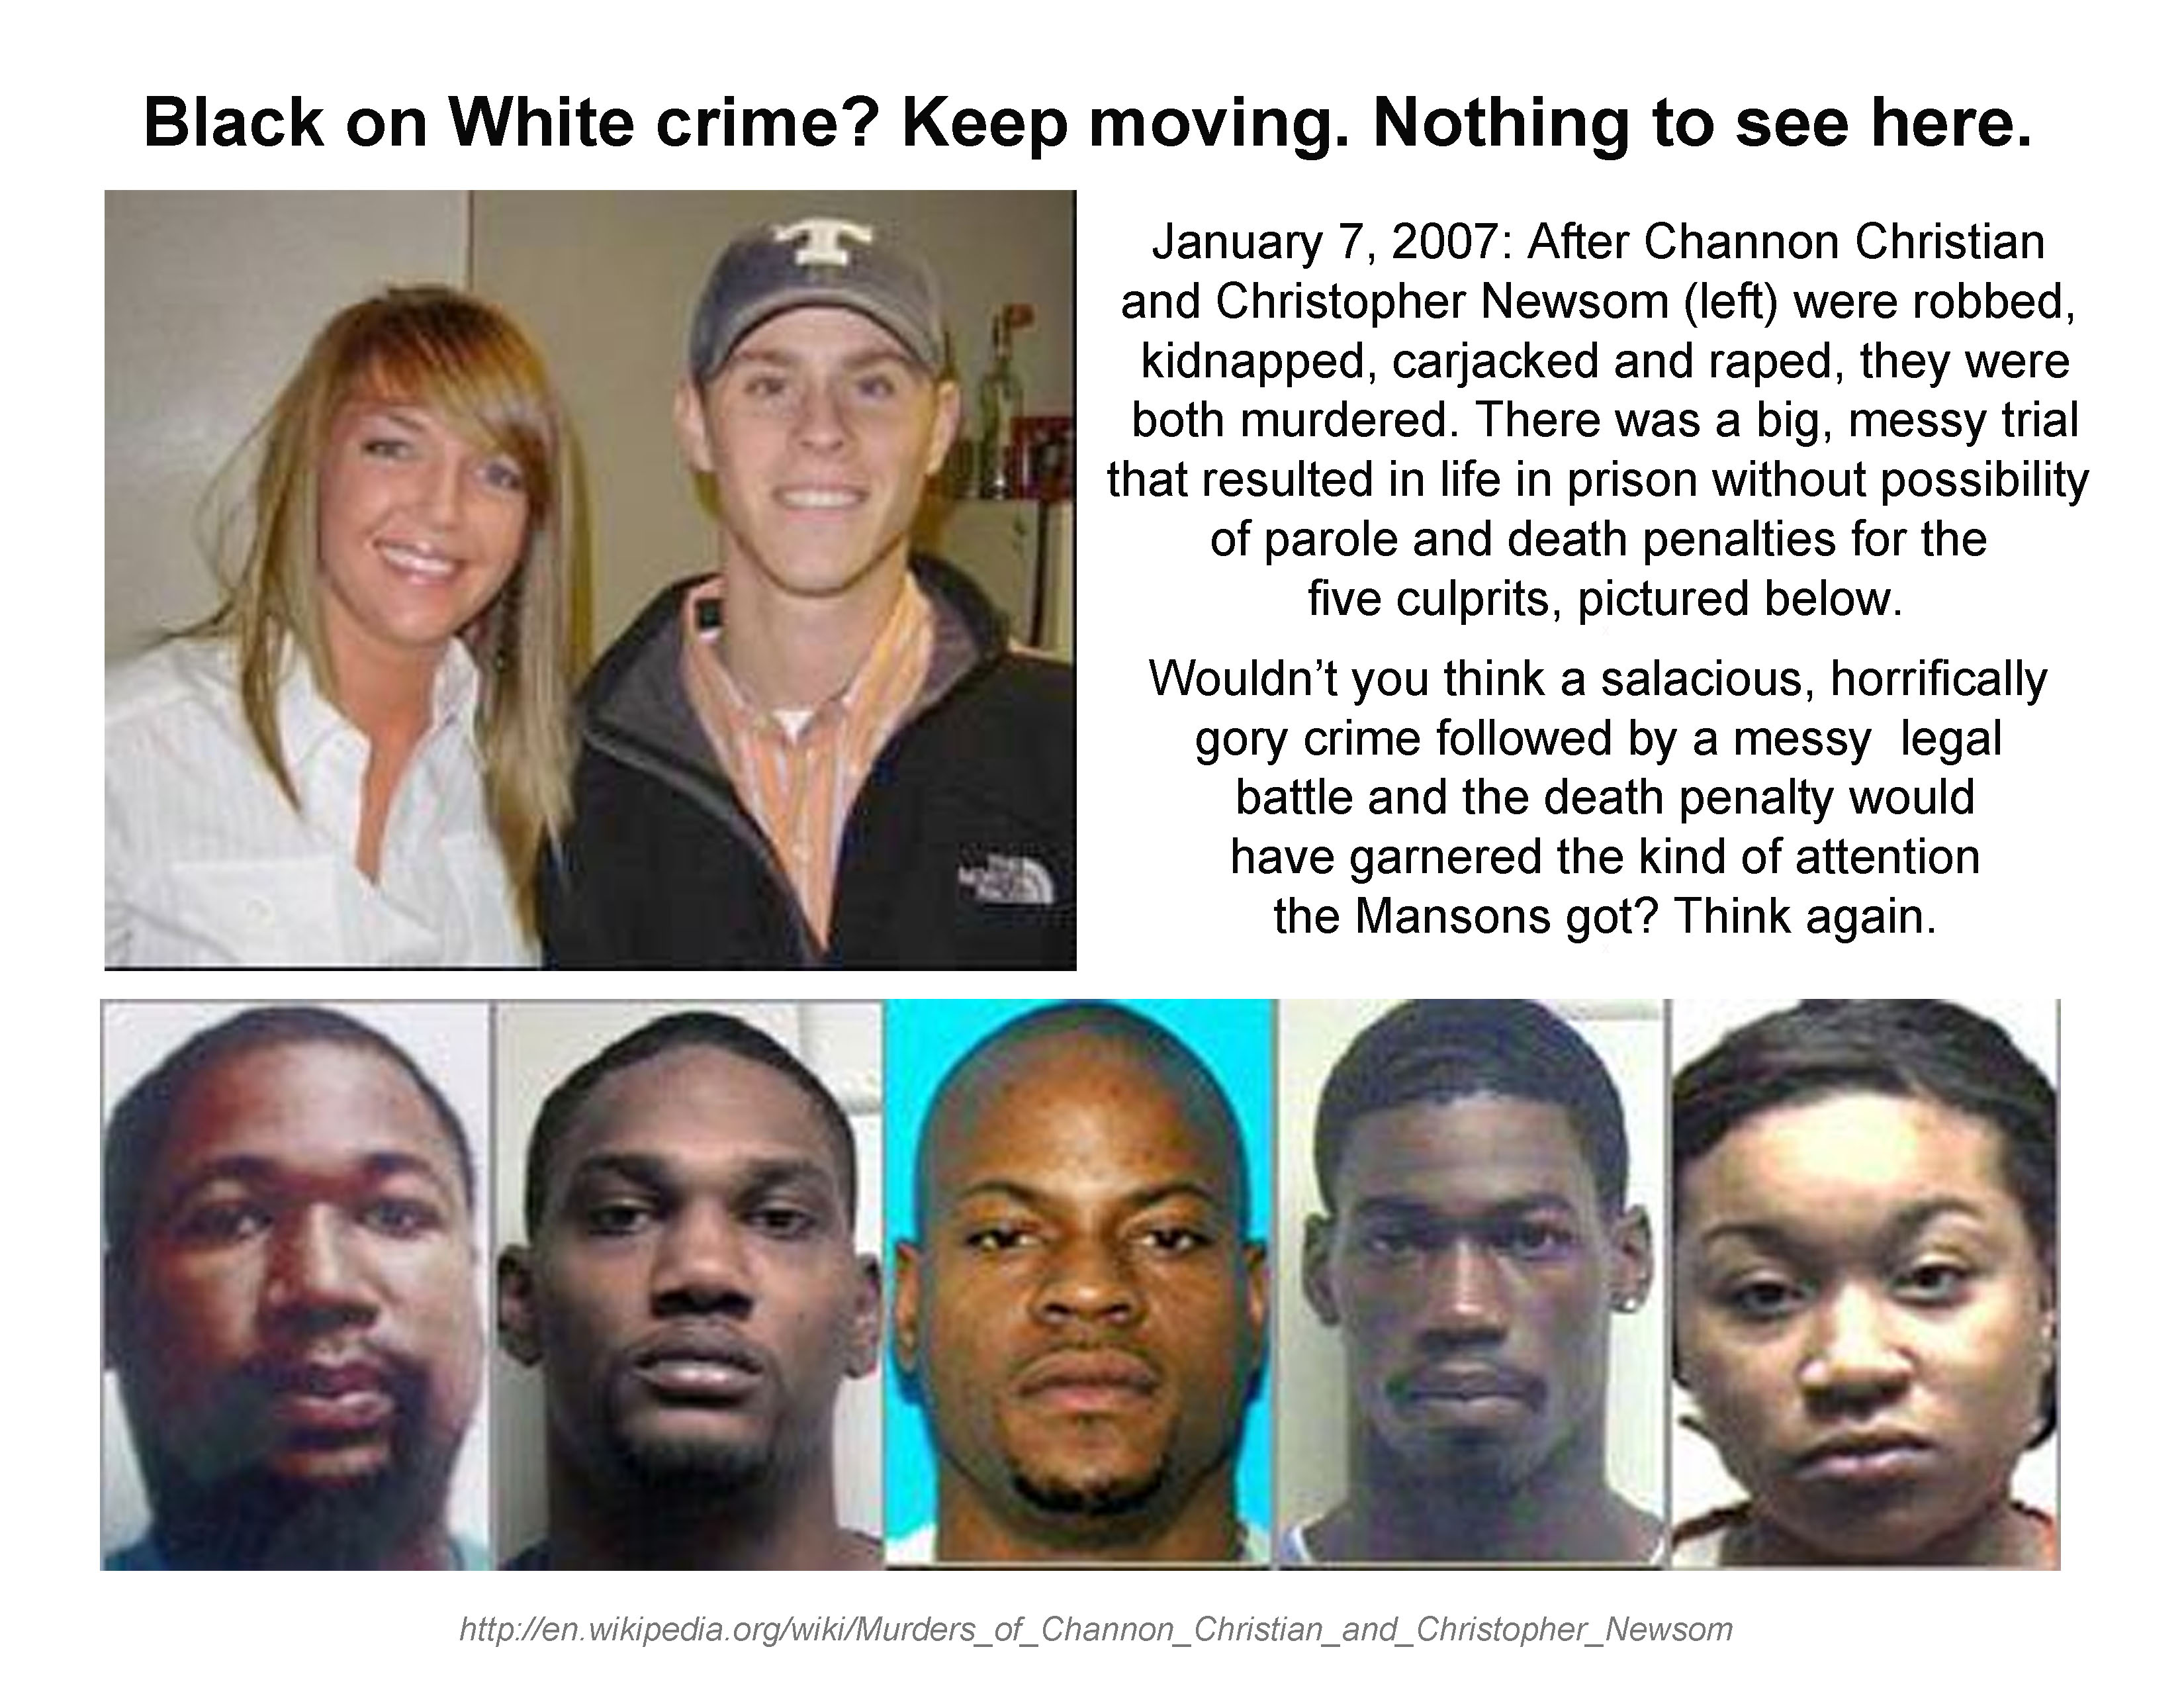 http://polination.files.wordpress.com/2012/03/media-crickets-over-christian-newsom-murders.jpg